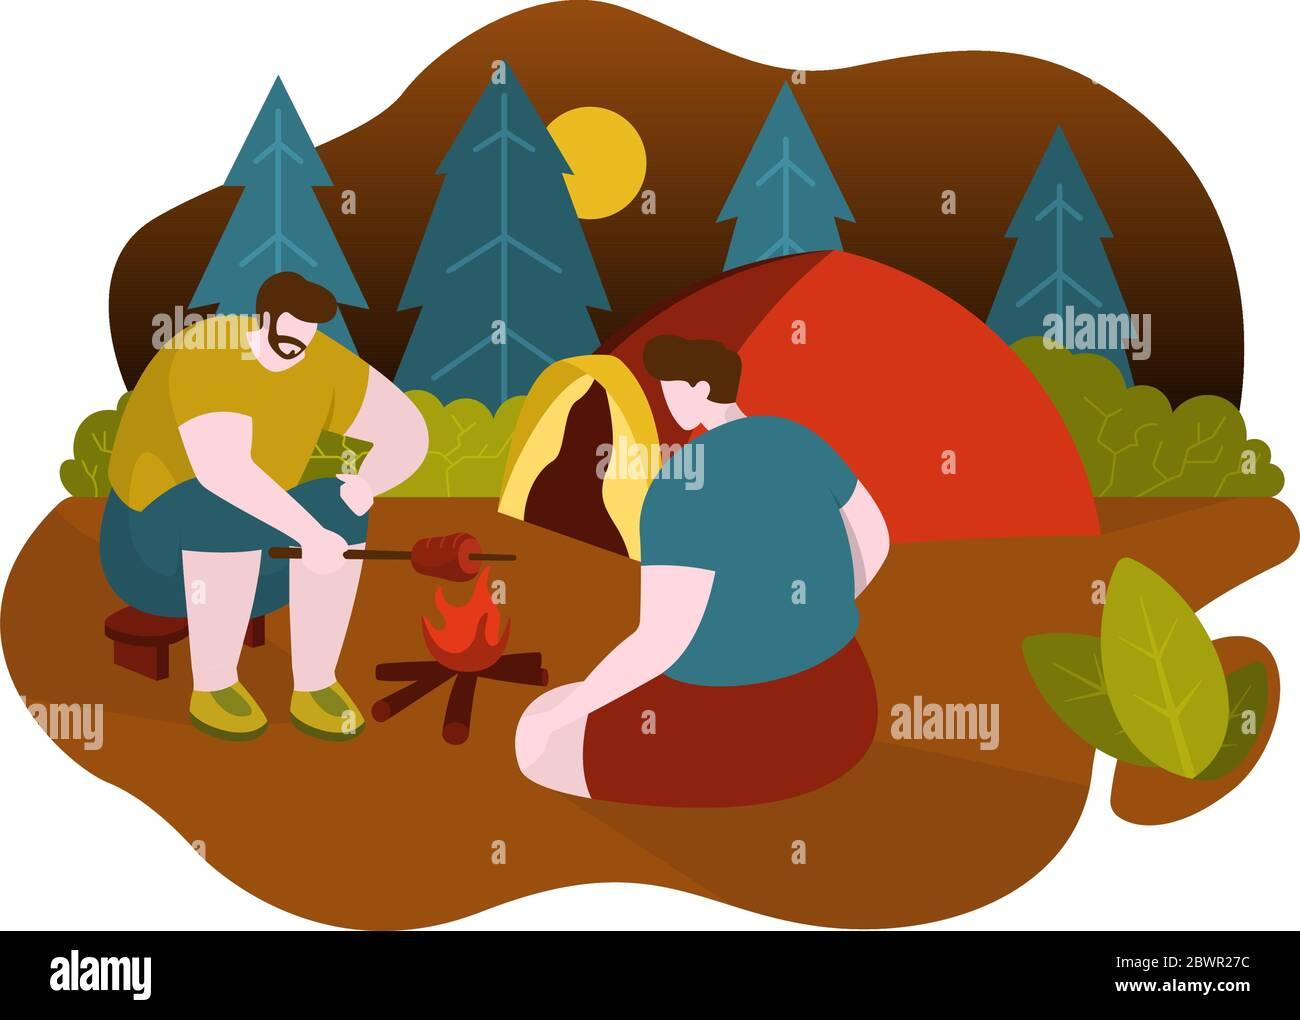 Hommes Camping Griller De La Viande Avec Feu De Camp Pres De La Tente Dessin Plat Illustration Image Vectorielle Stock Alamy